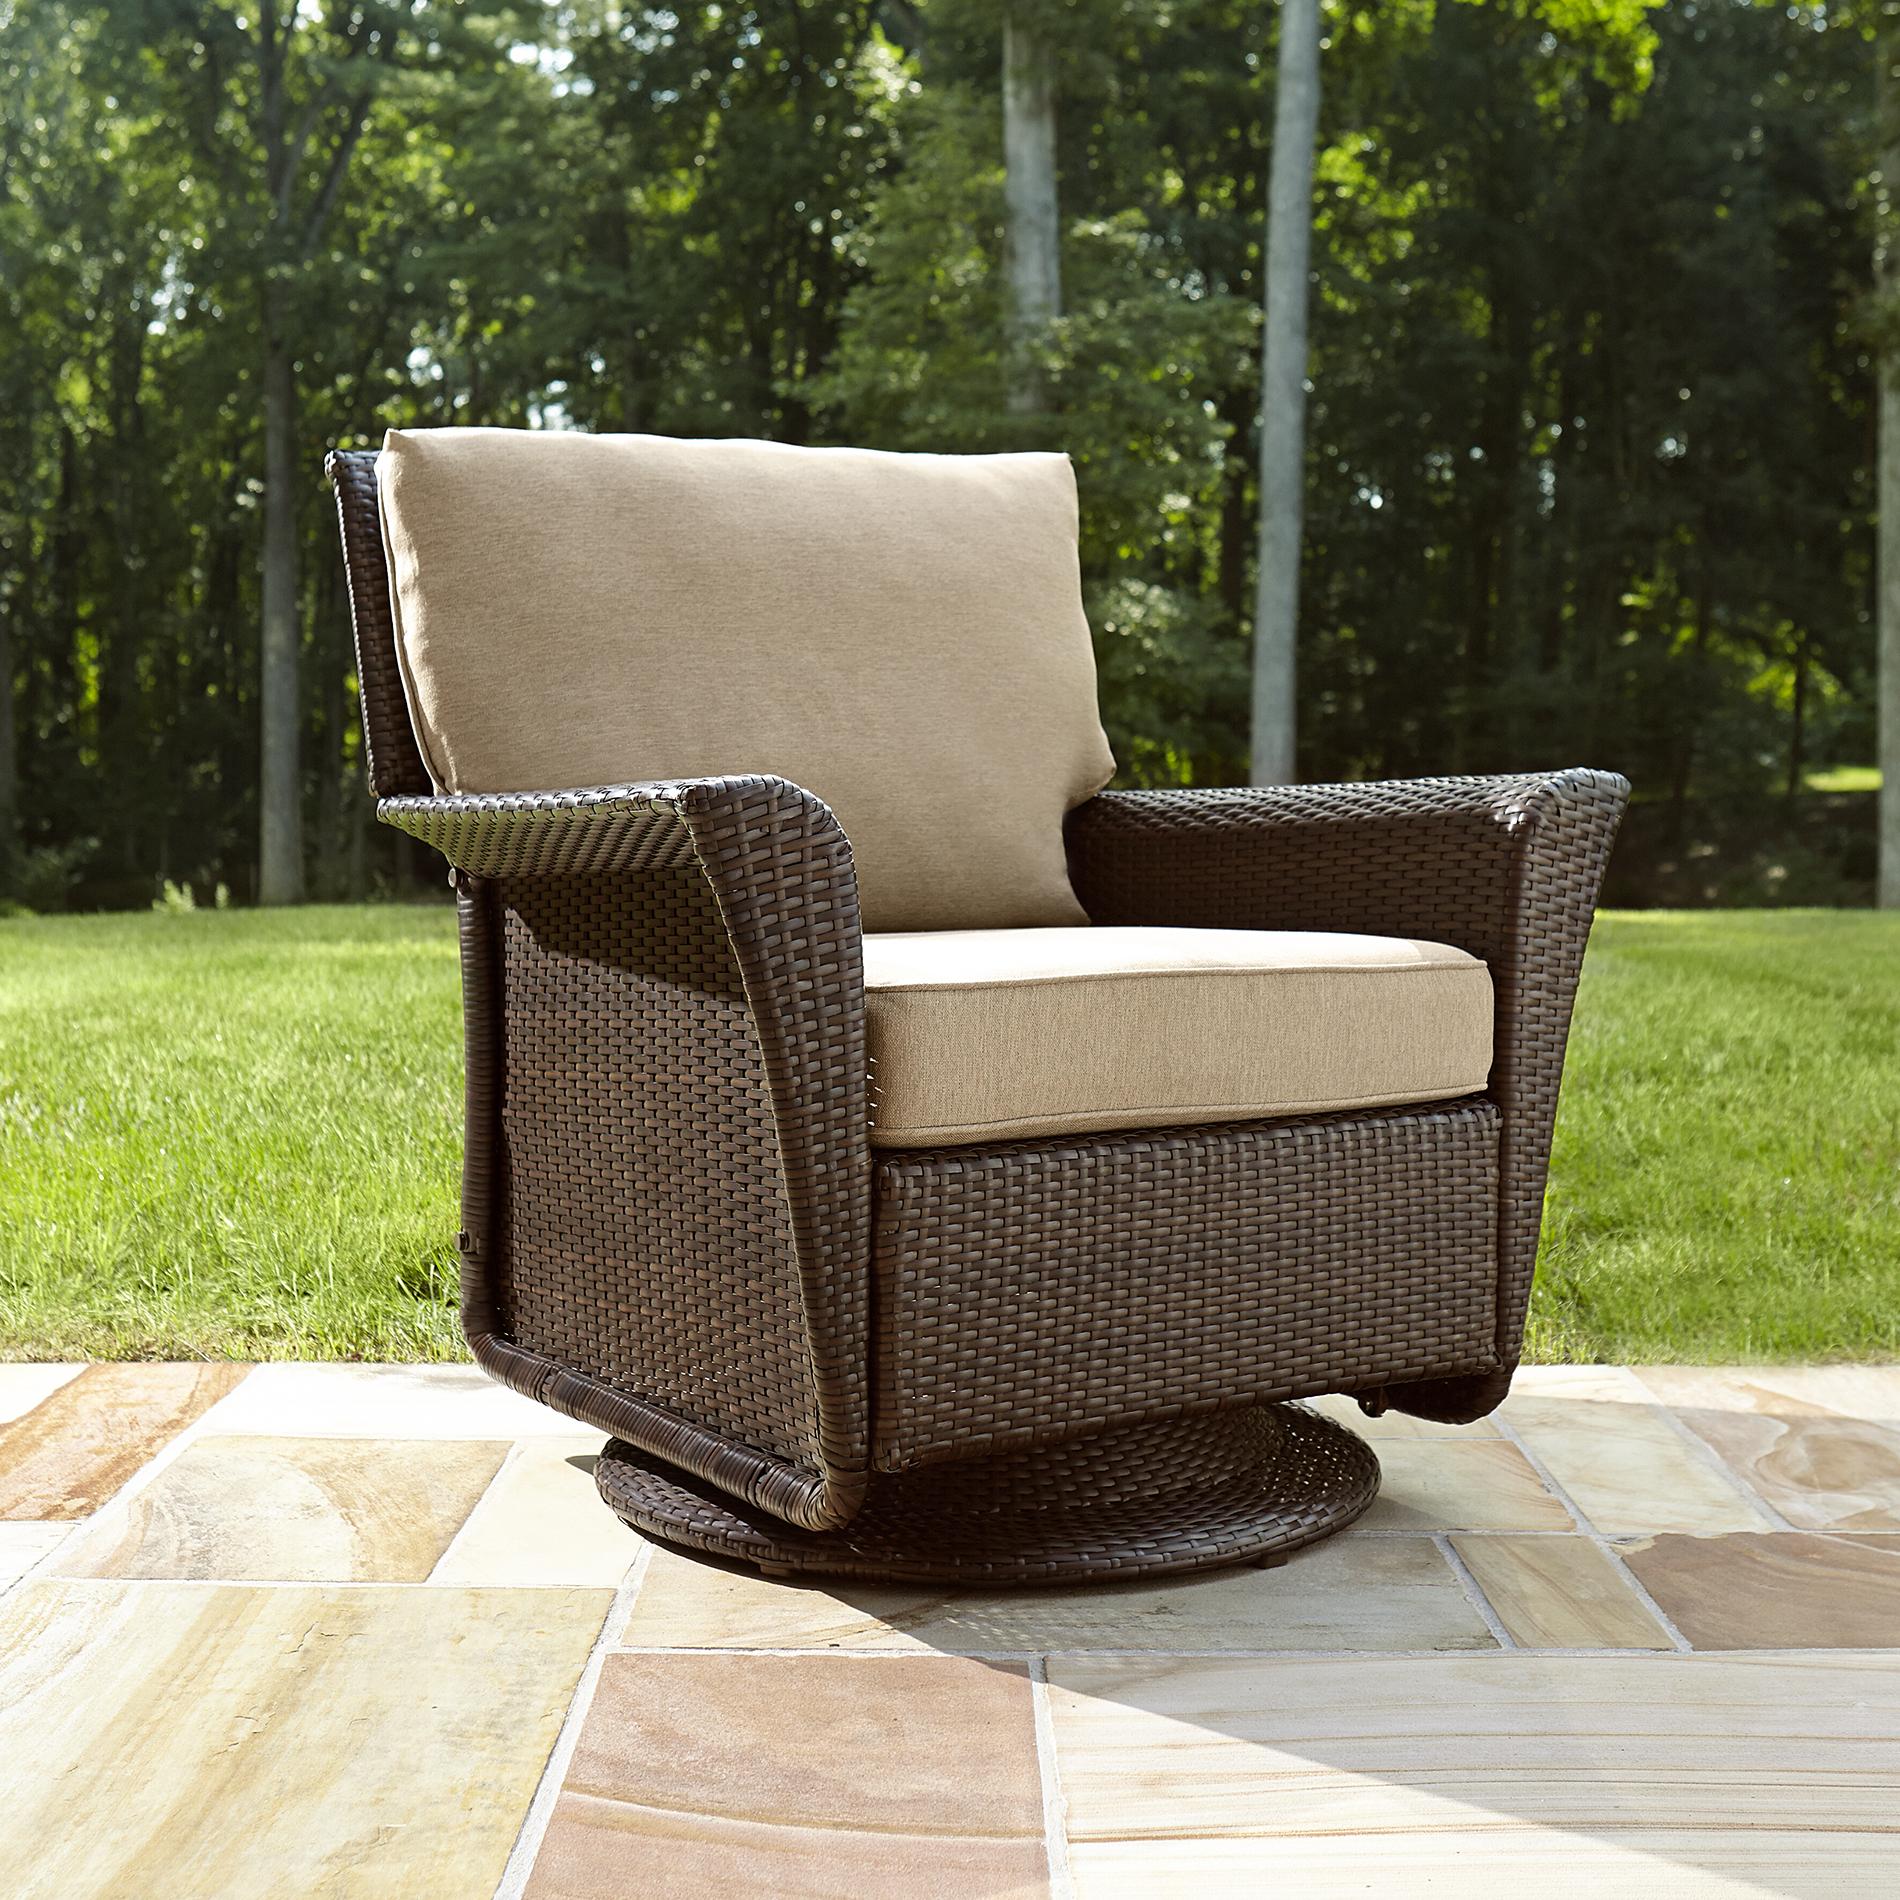 Attirant Ty Pennington Style Parkside Swivel Glider Chair